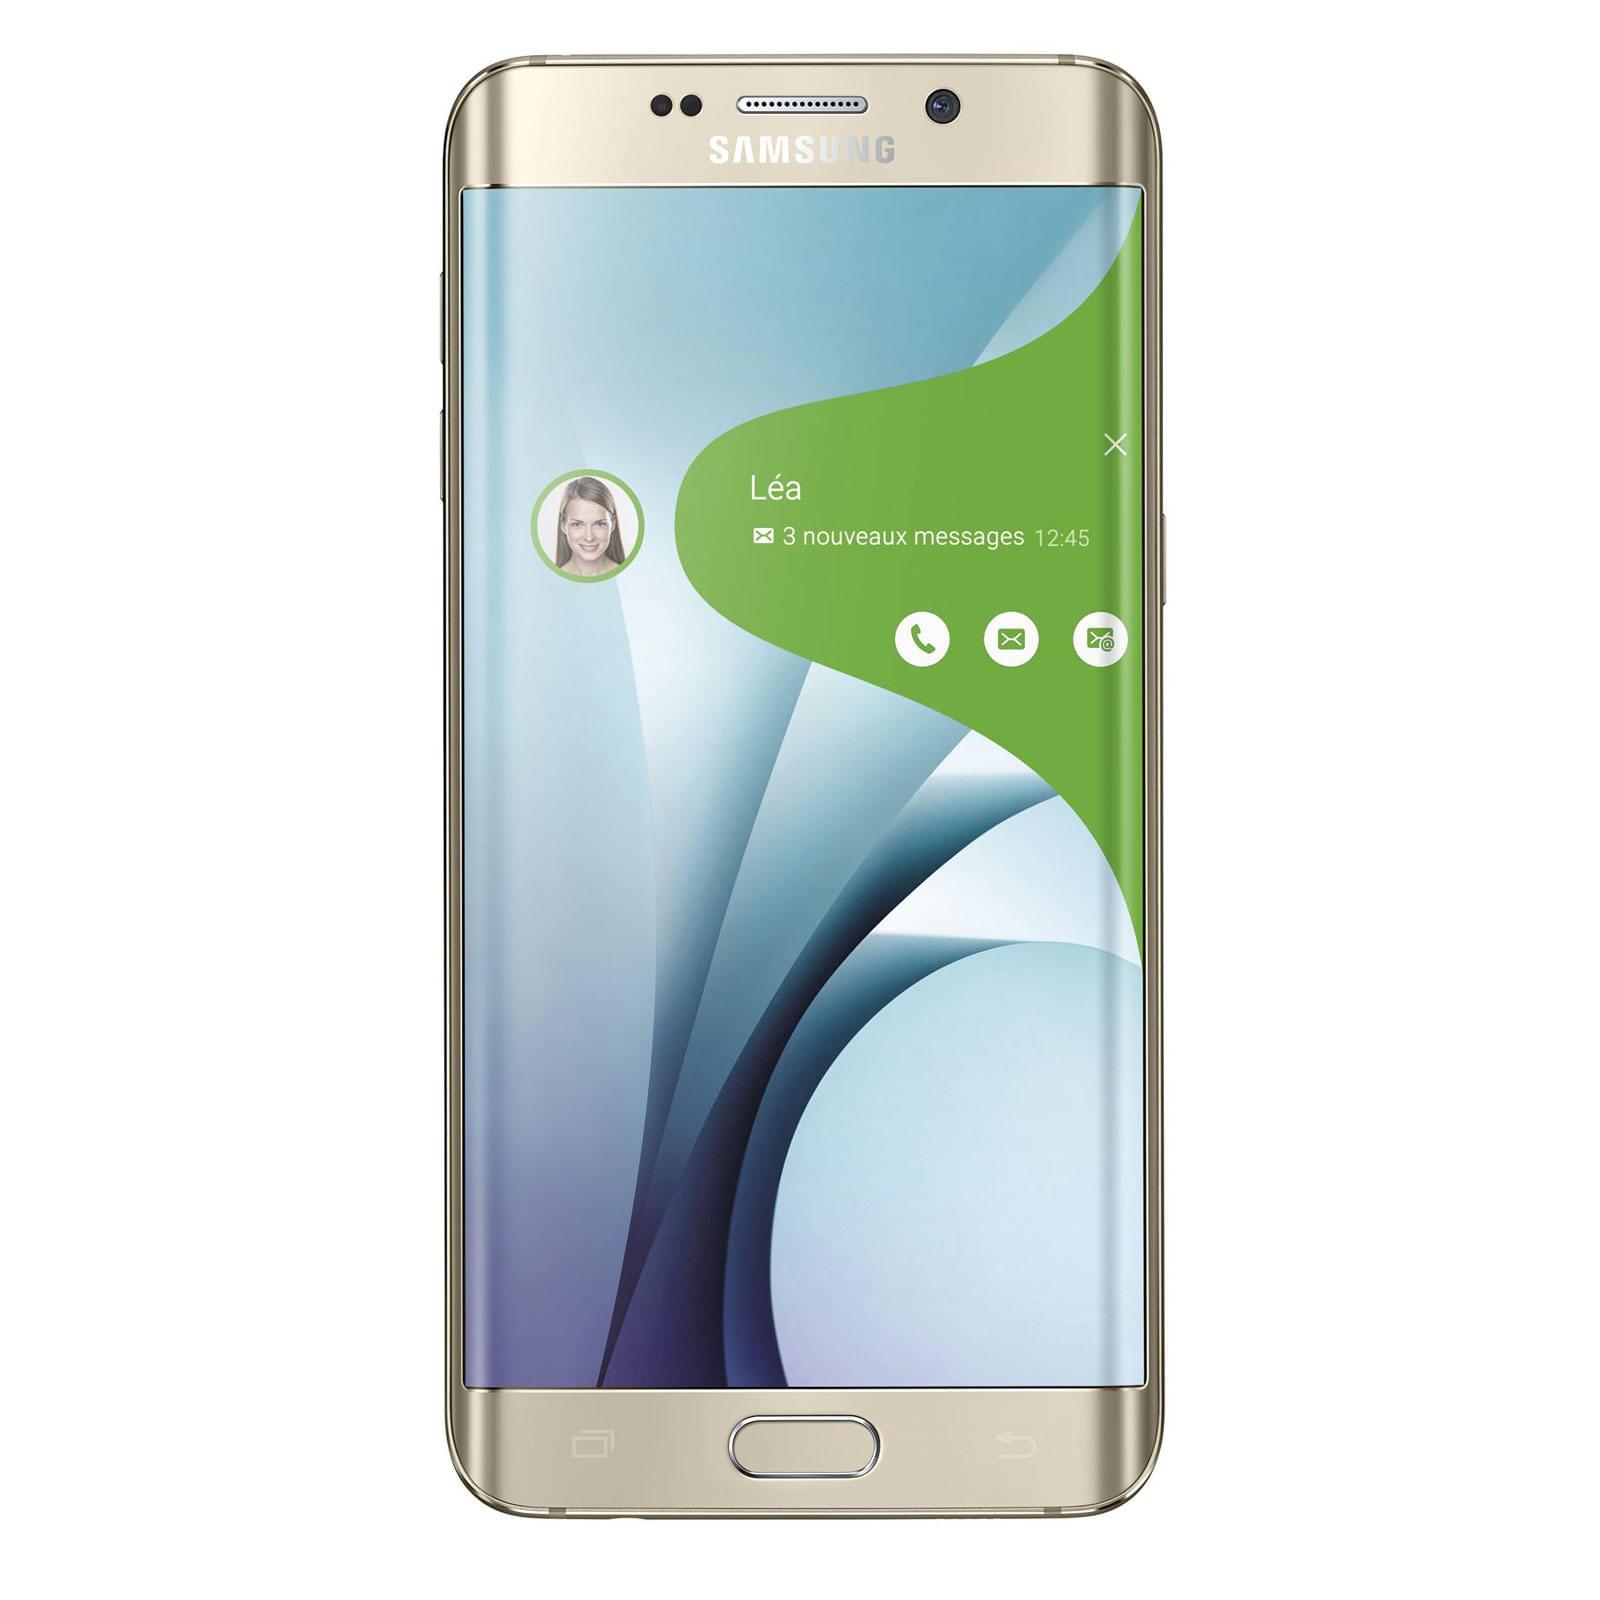 Samsung Galaxy S6 Edge+ 32Go SM-G928F Gold - Achat / Vente Téléphonie sur Cybertek.fr - 0